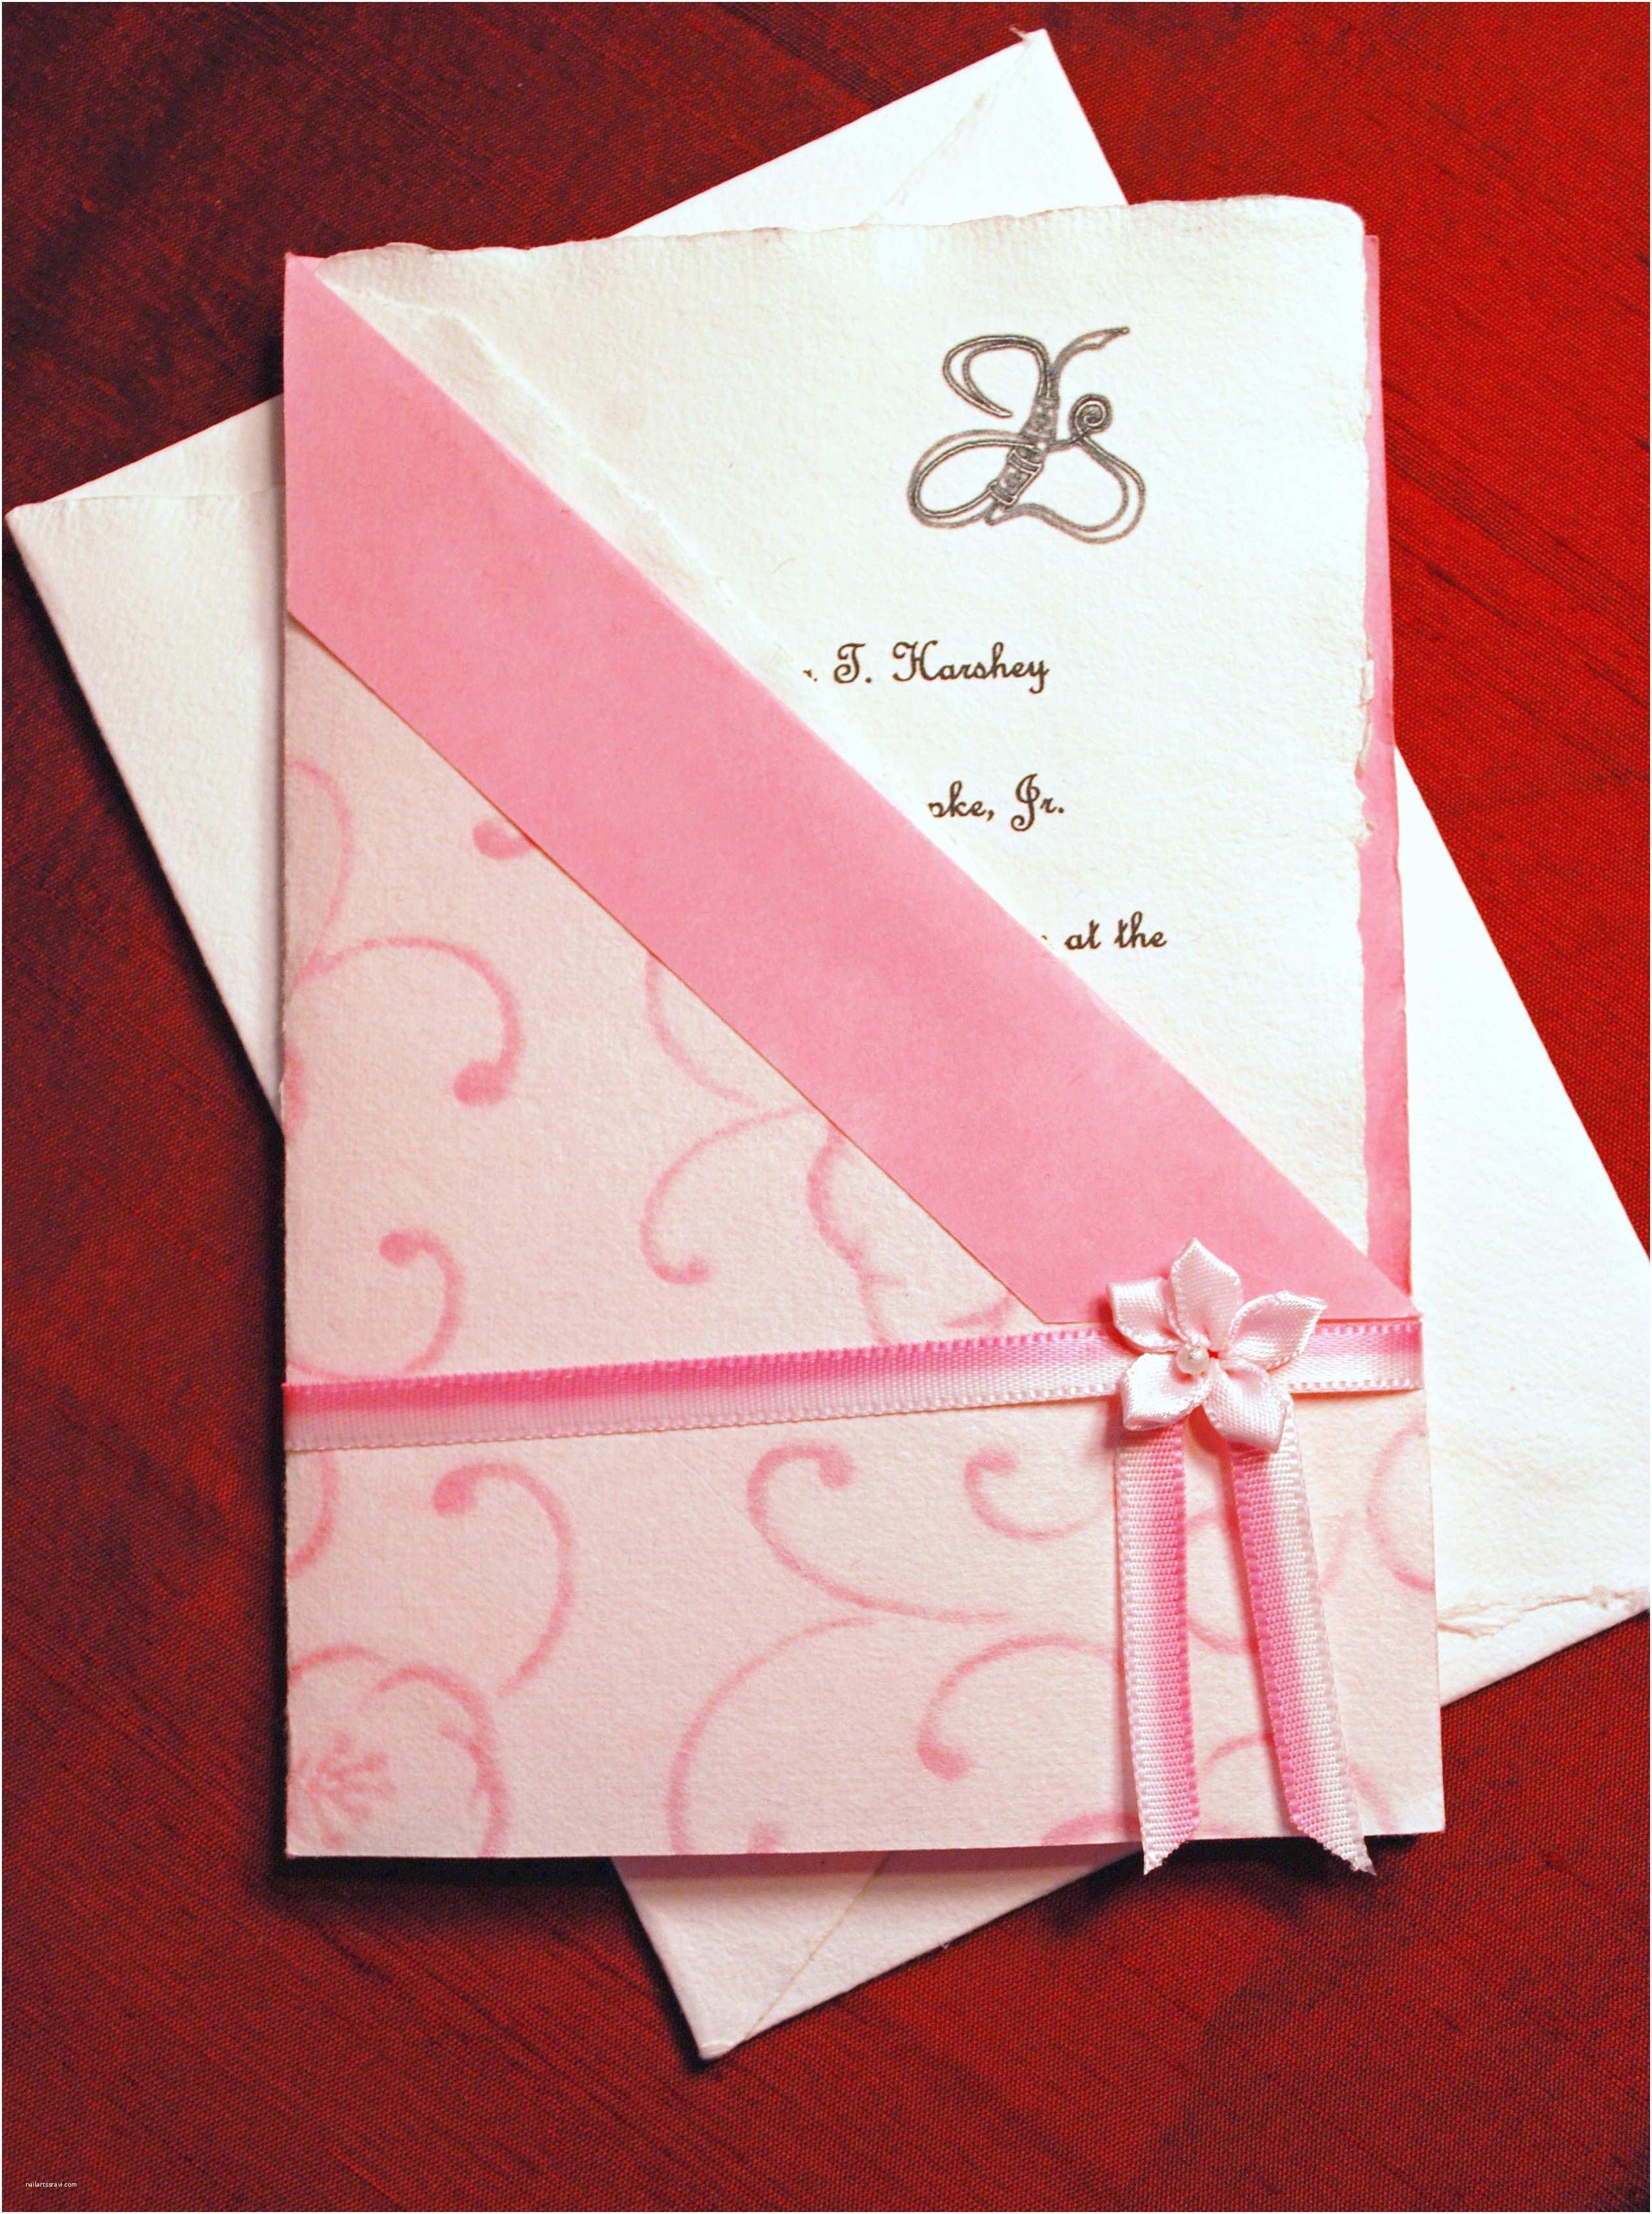 Most Beautiful Wedding Invitation Cards Beautiful Wedding Invitation Cards Samples